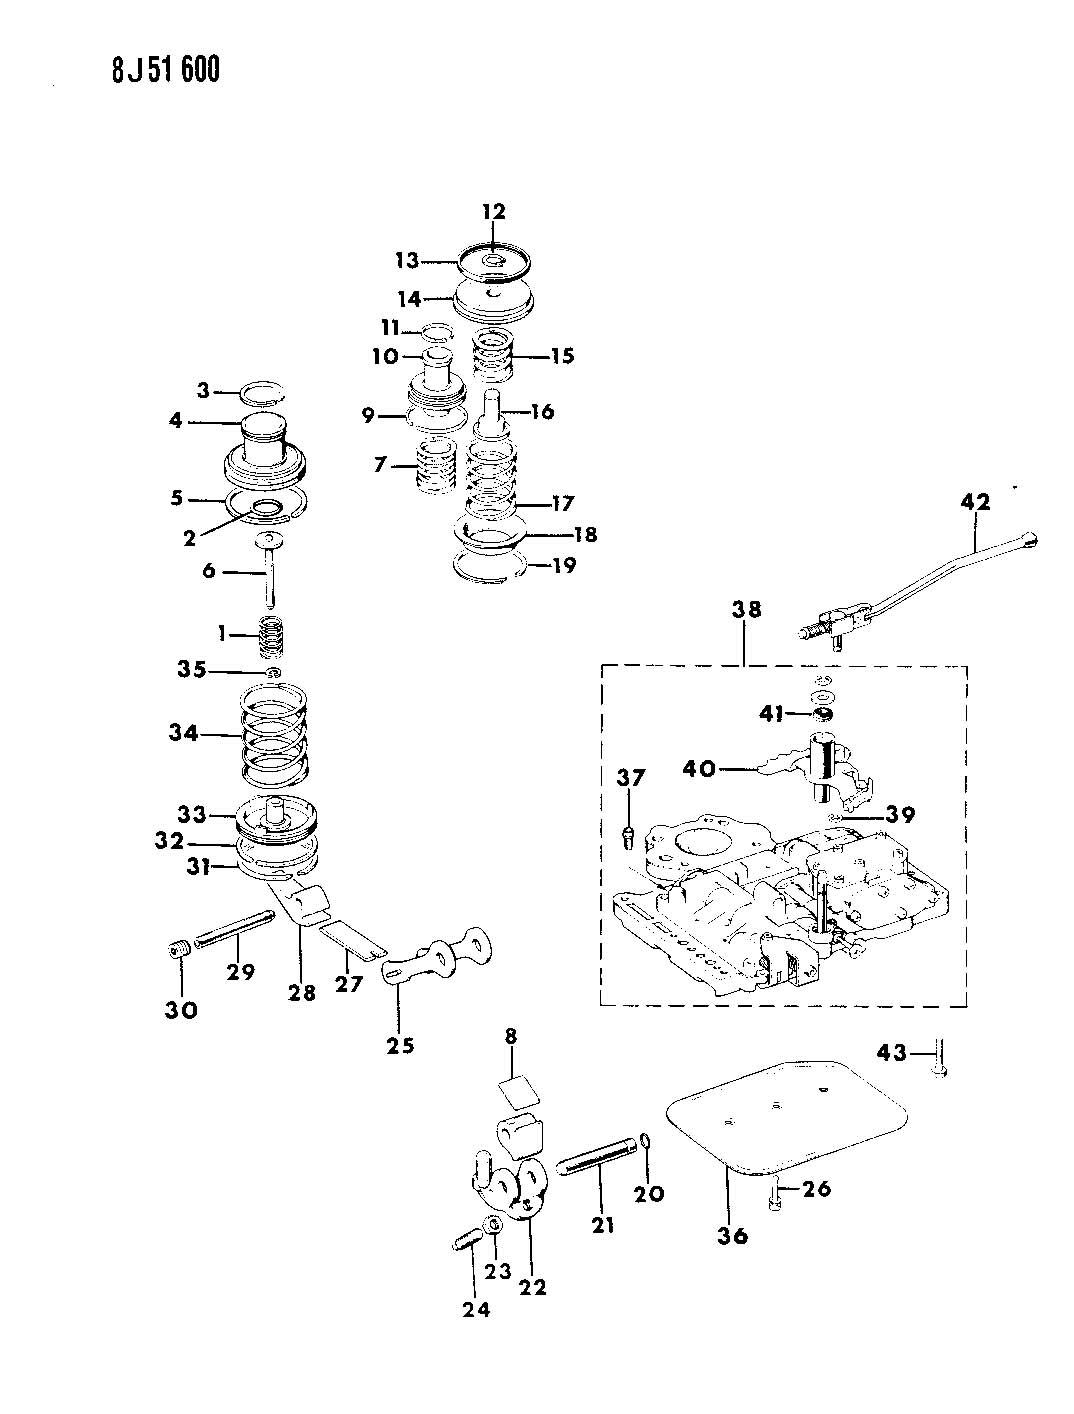 Jeep Wrangler Servos Accumulator And Valve Body